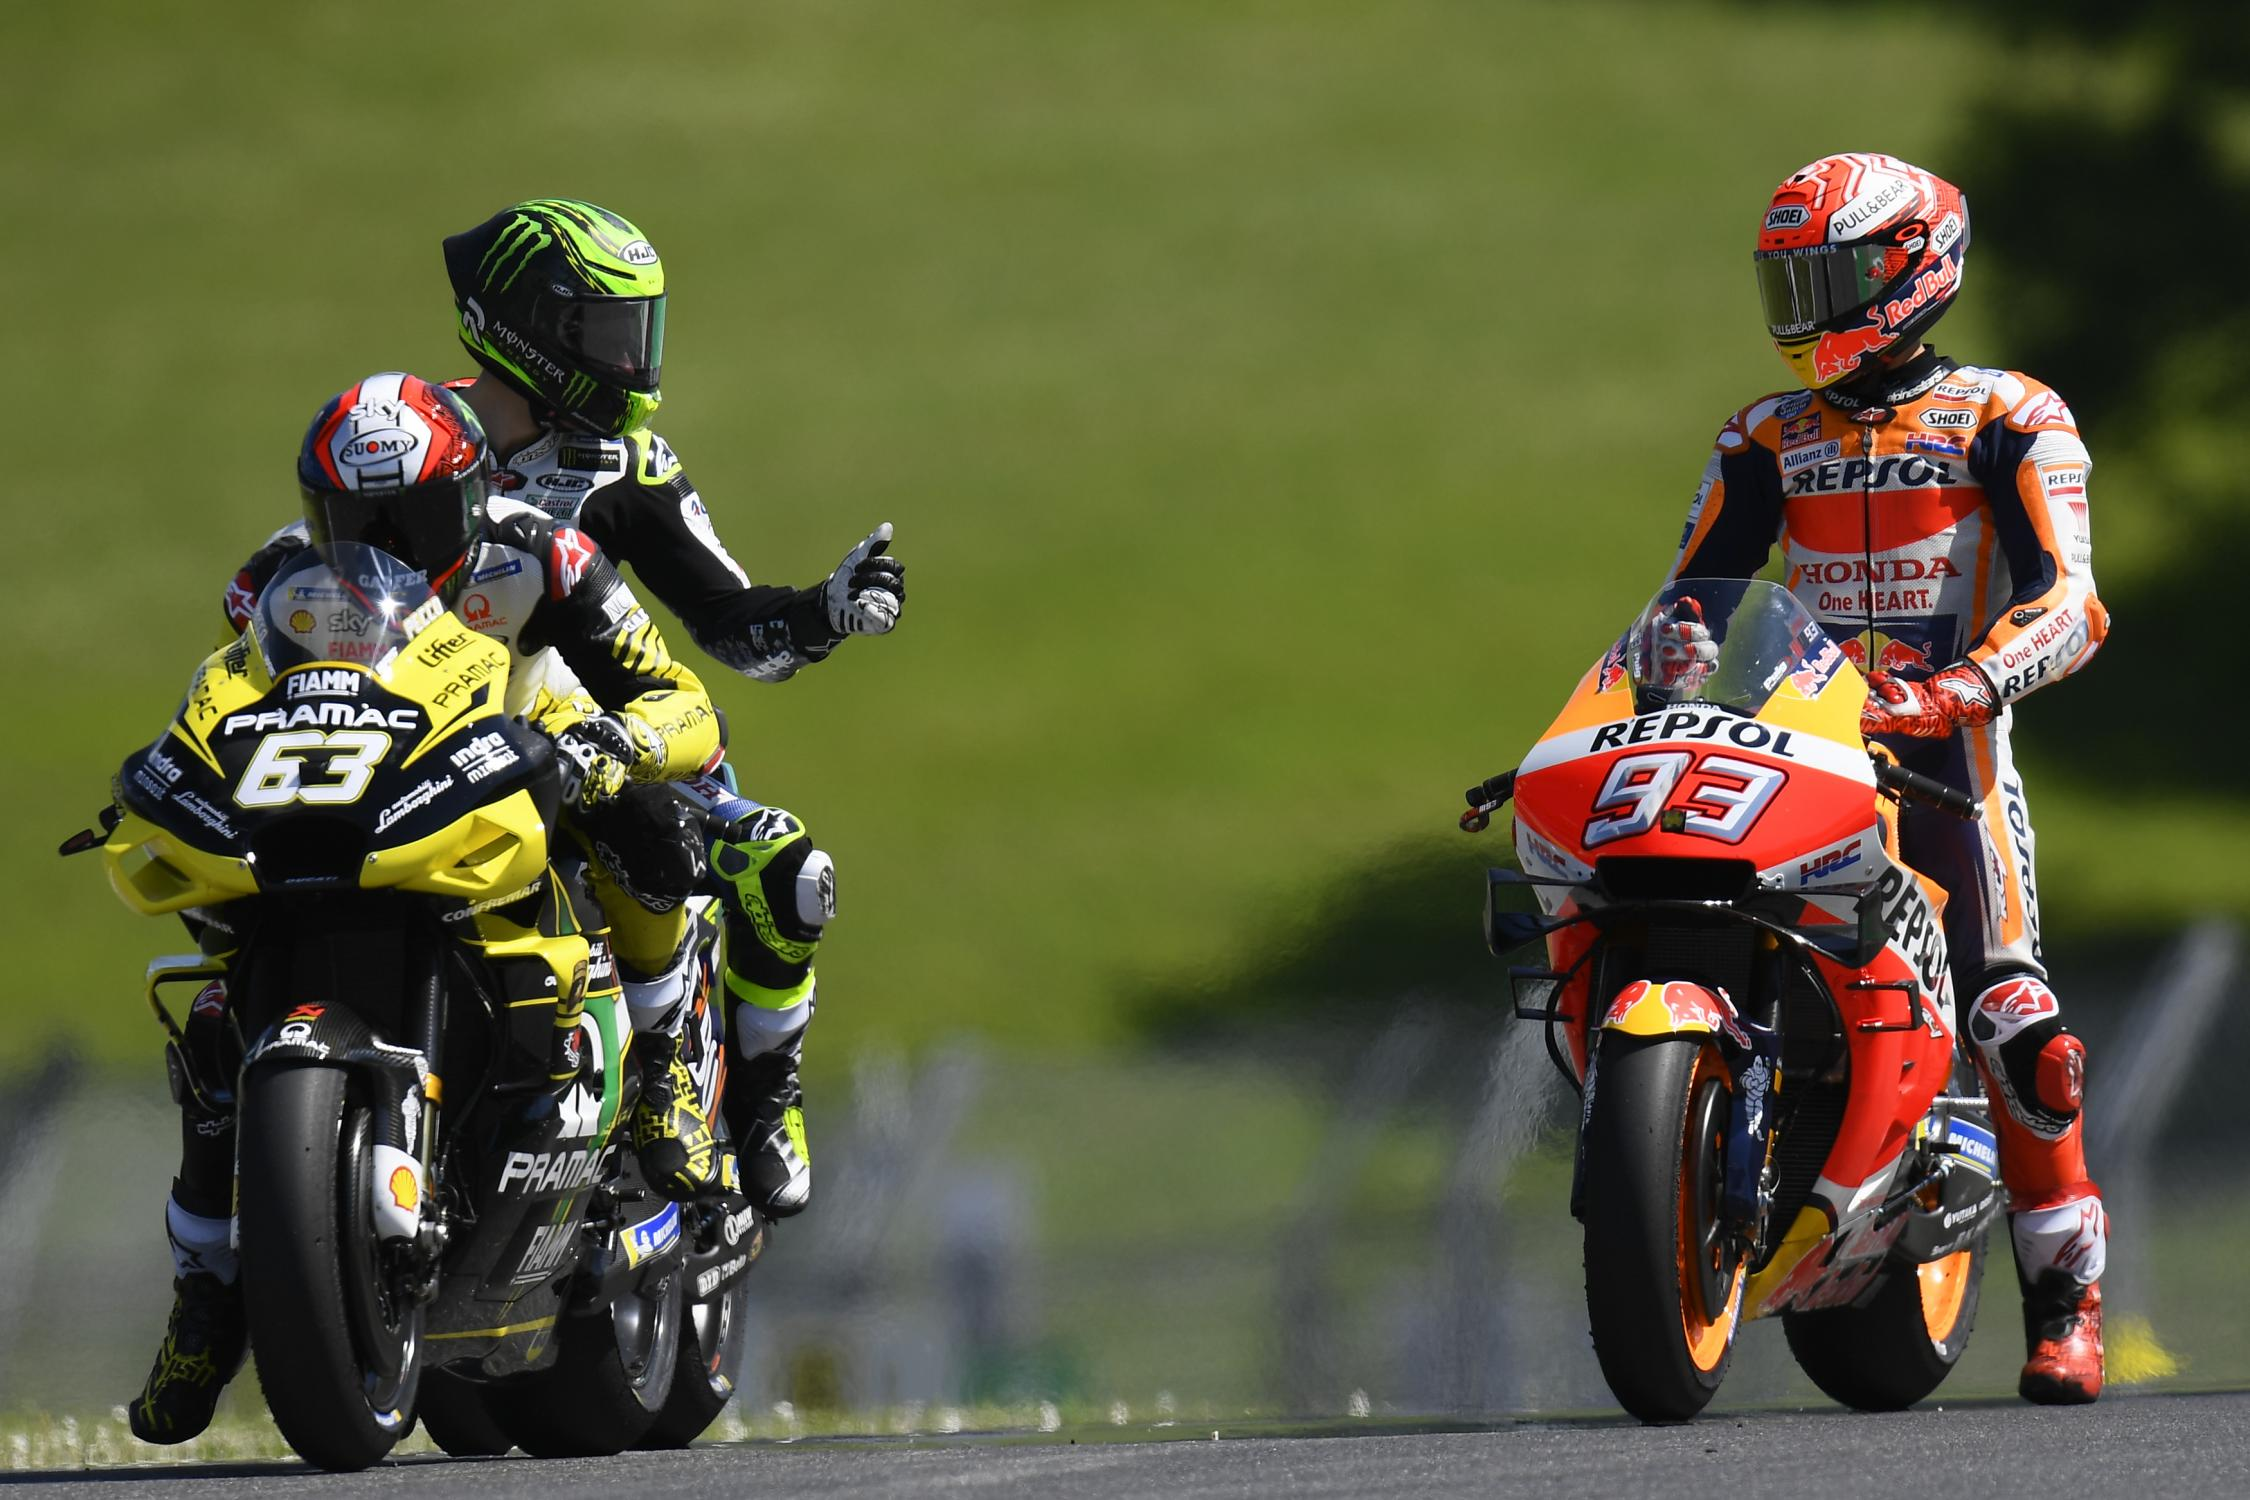 Dovizioso to leave Ducati at the end of 2020 MotoGP season